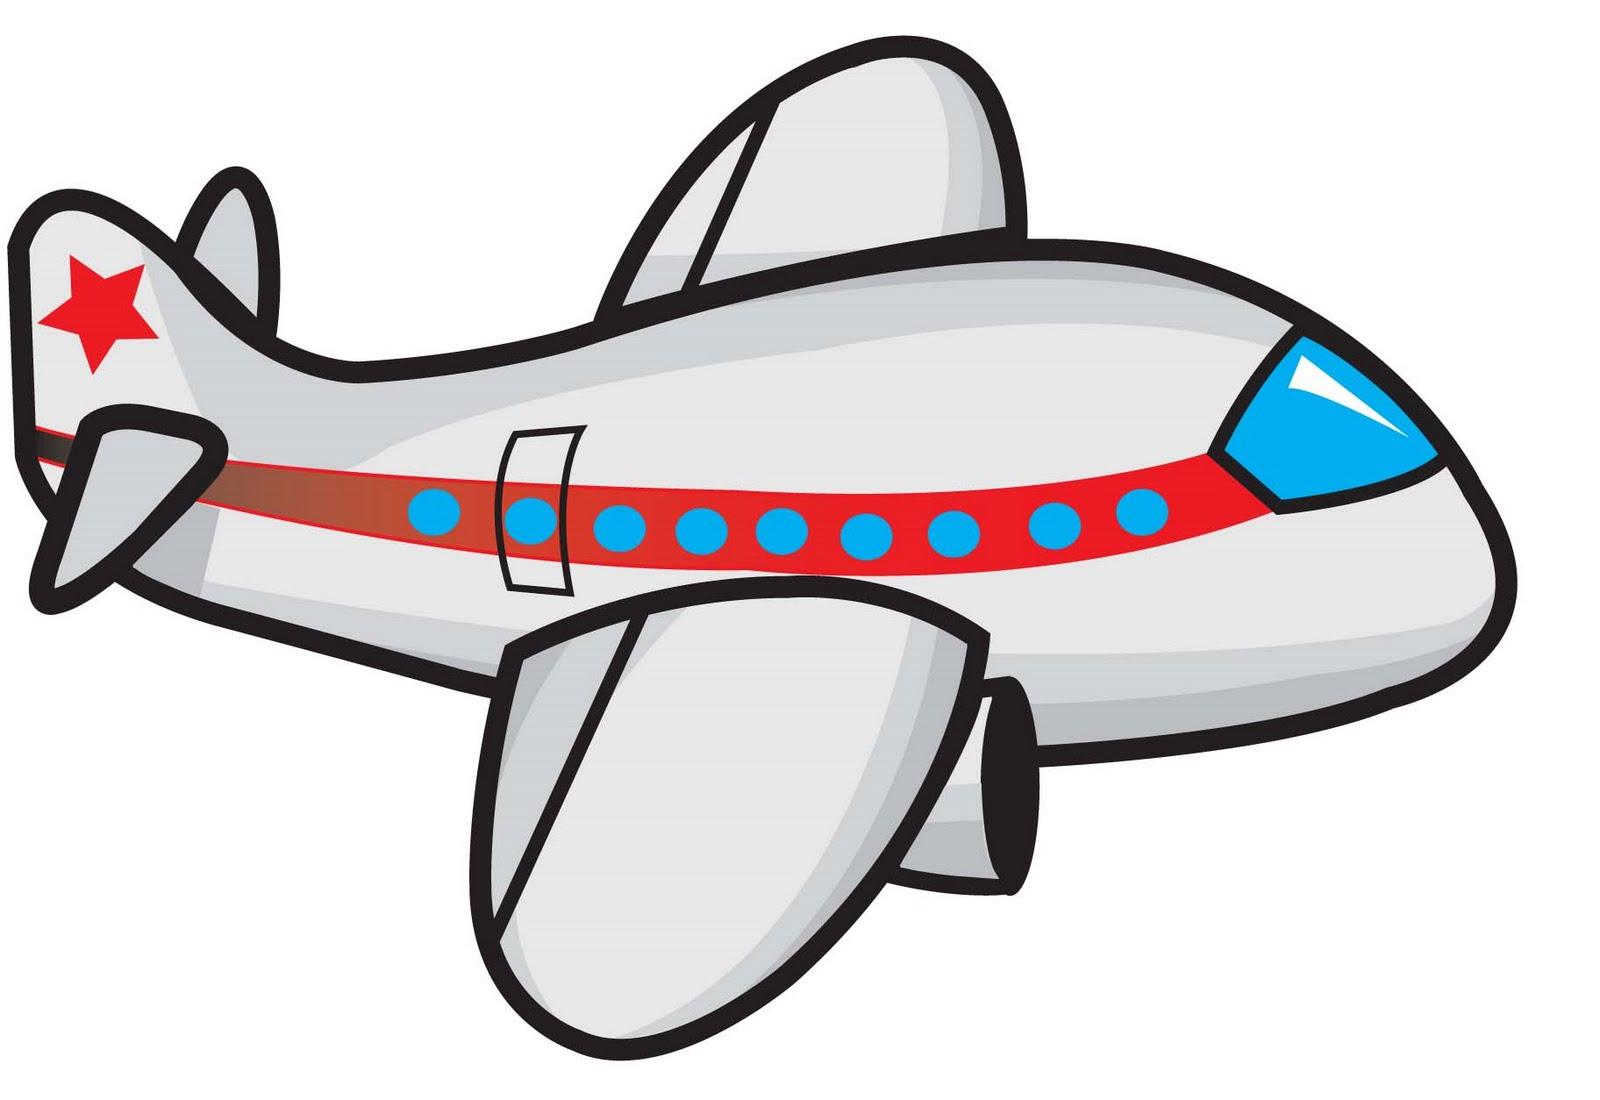 1600x1100 Drawn Cartoon Plane